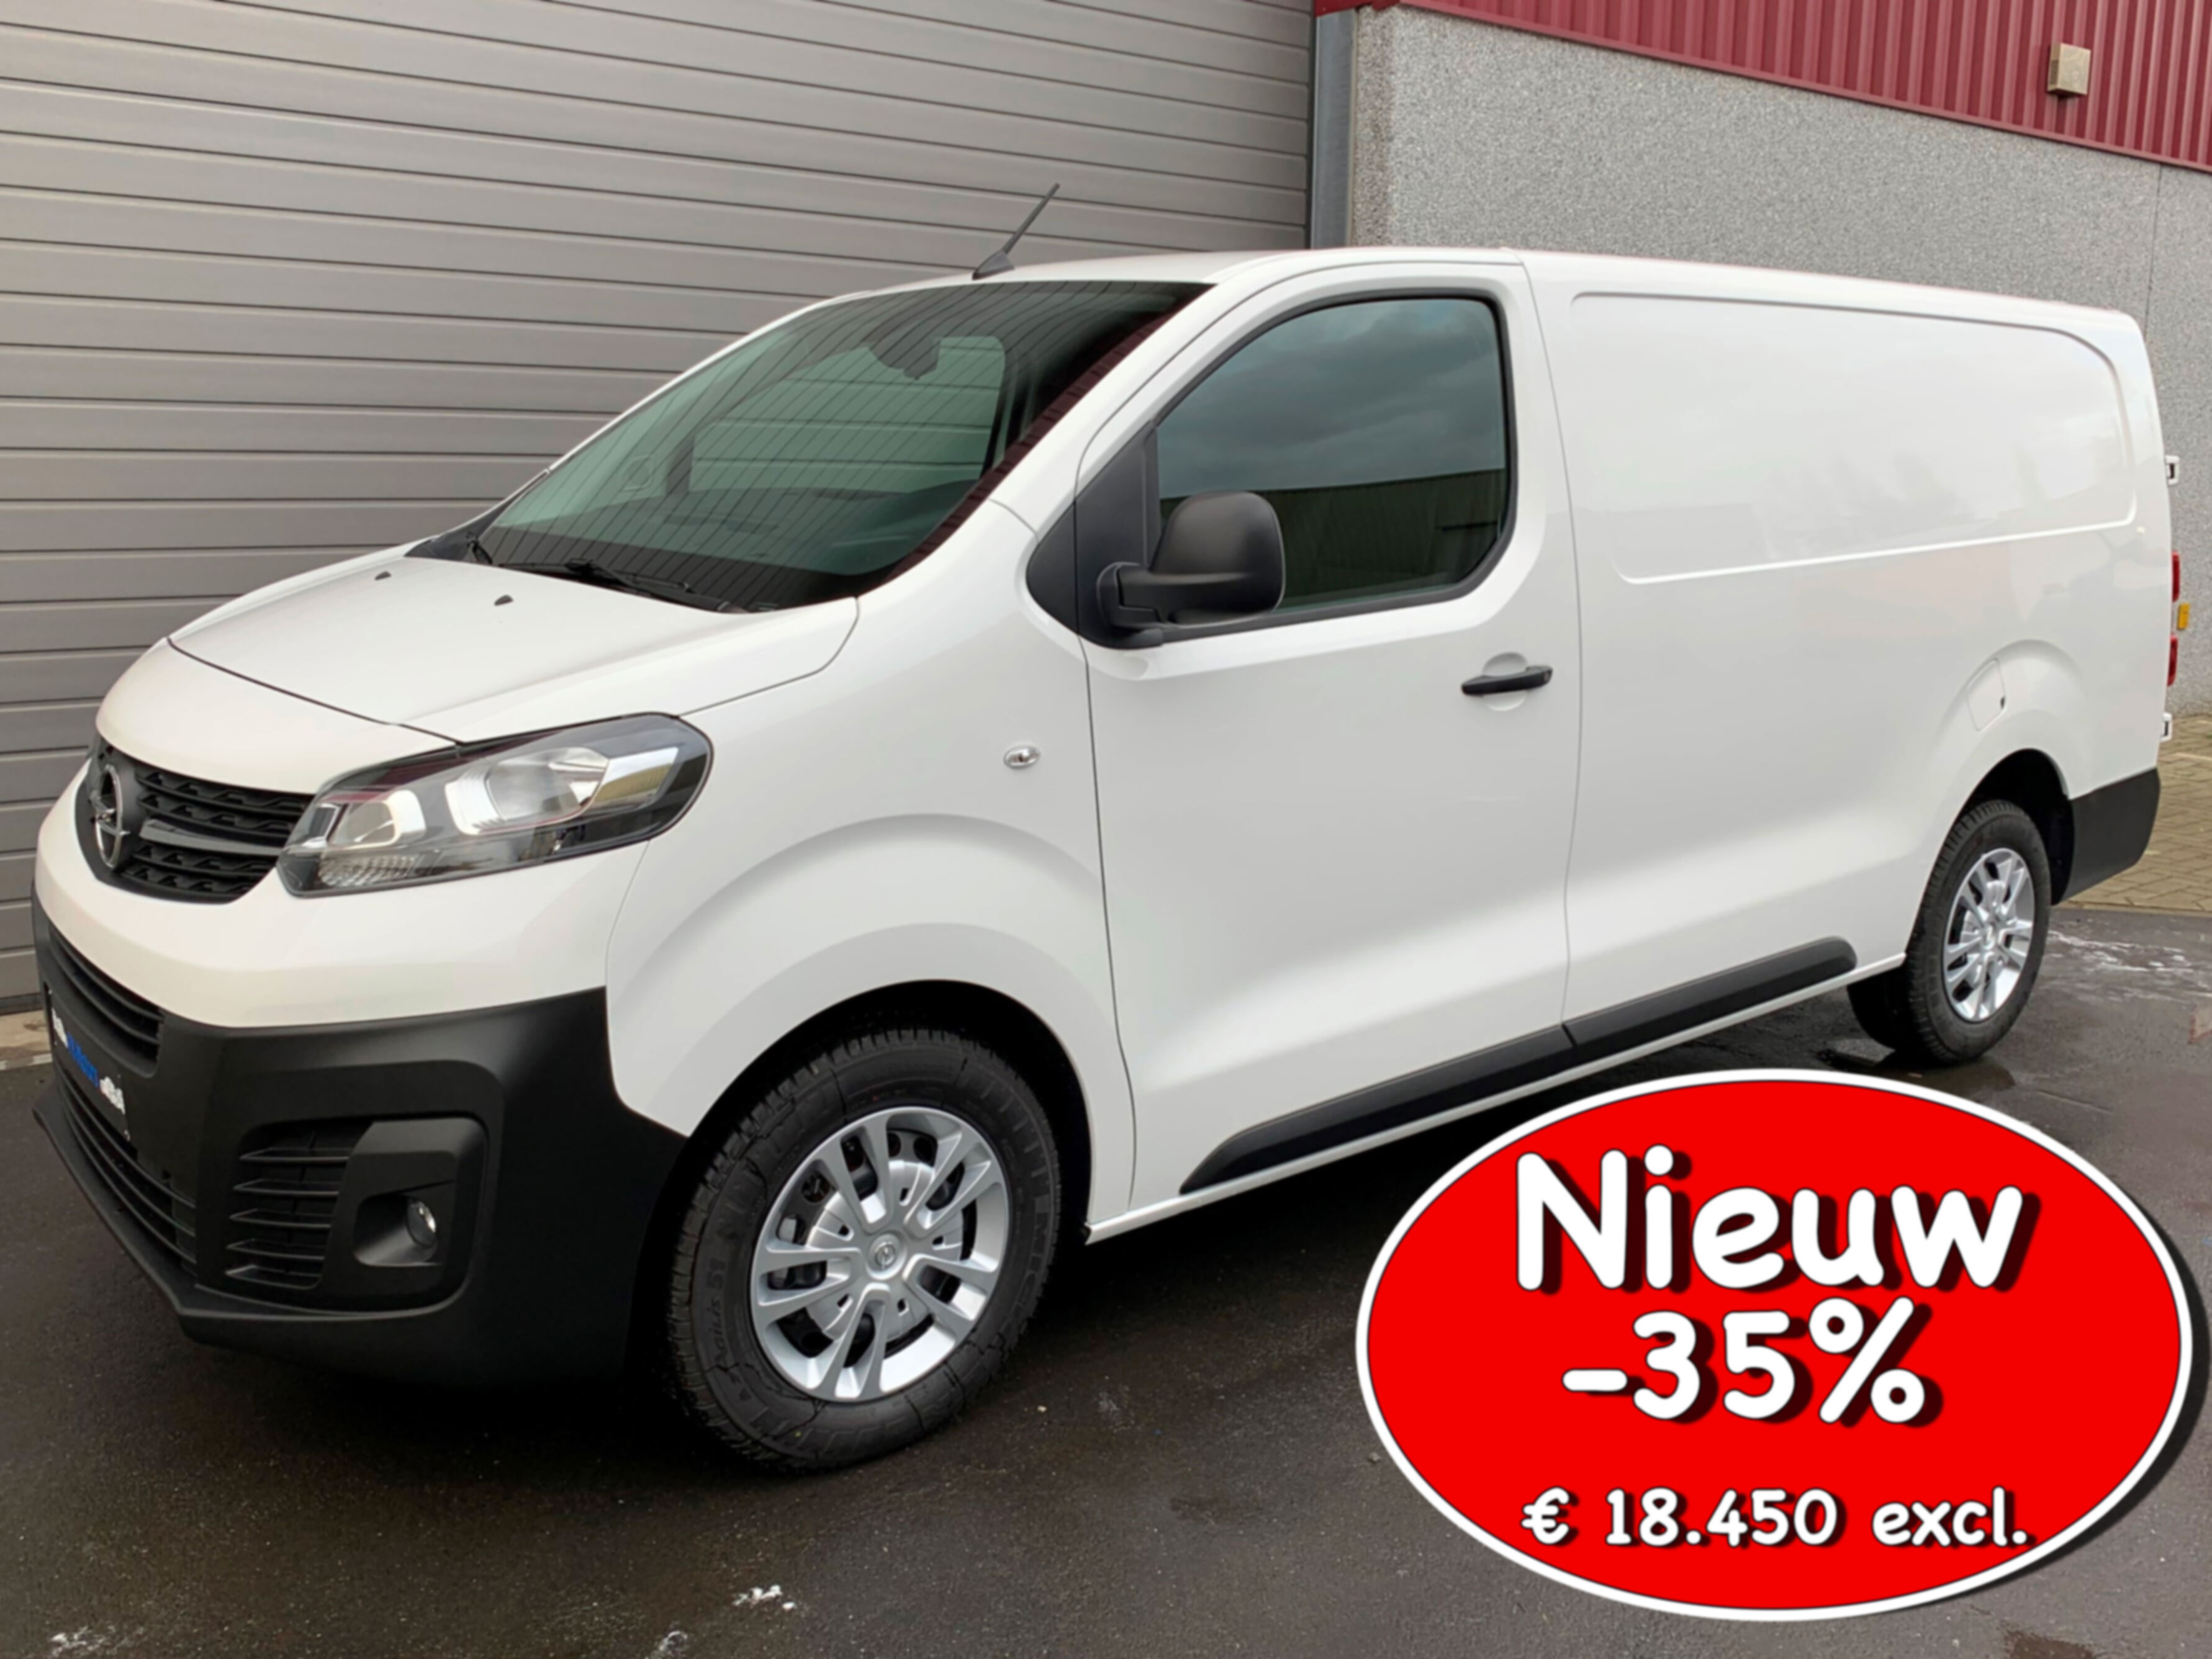 Opel Vivaro 2.0D 122PK Edition L3H1 NIEUW in stock 35% korting